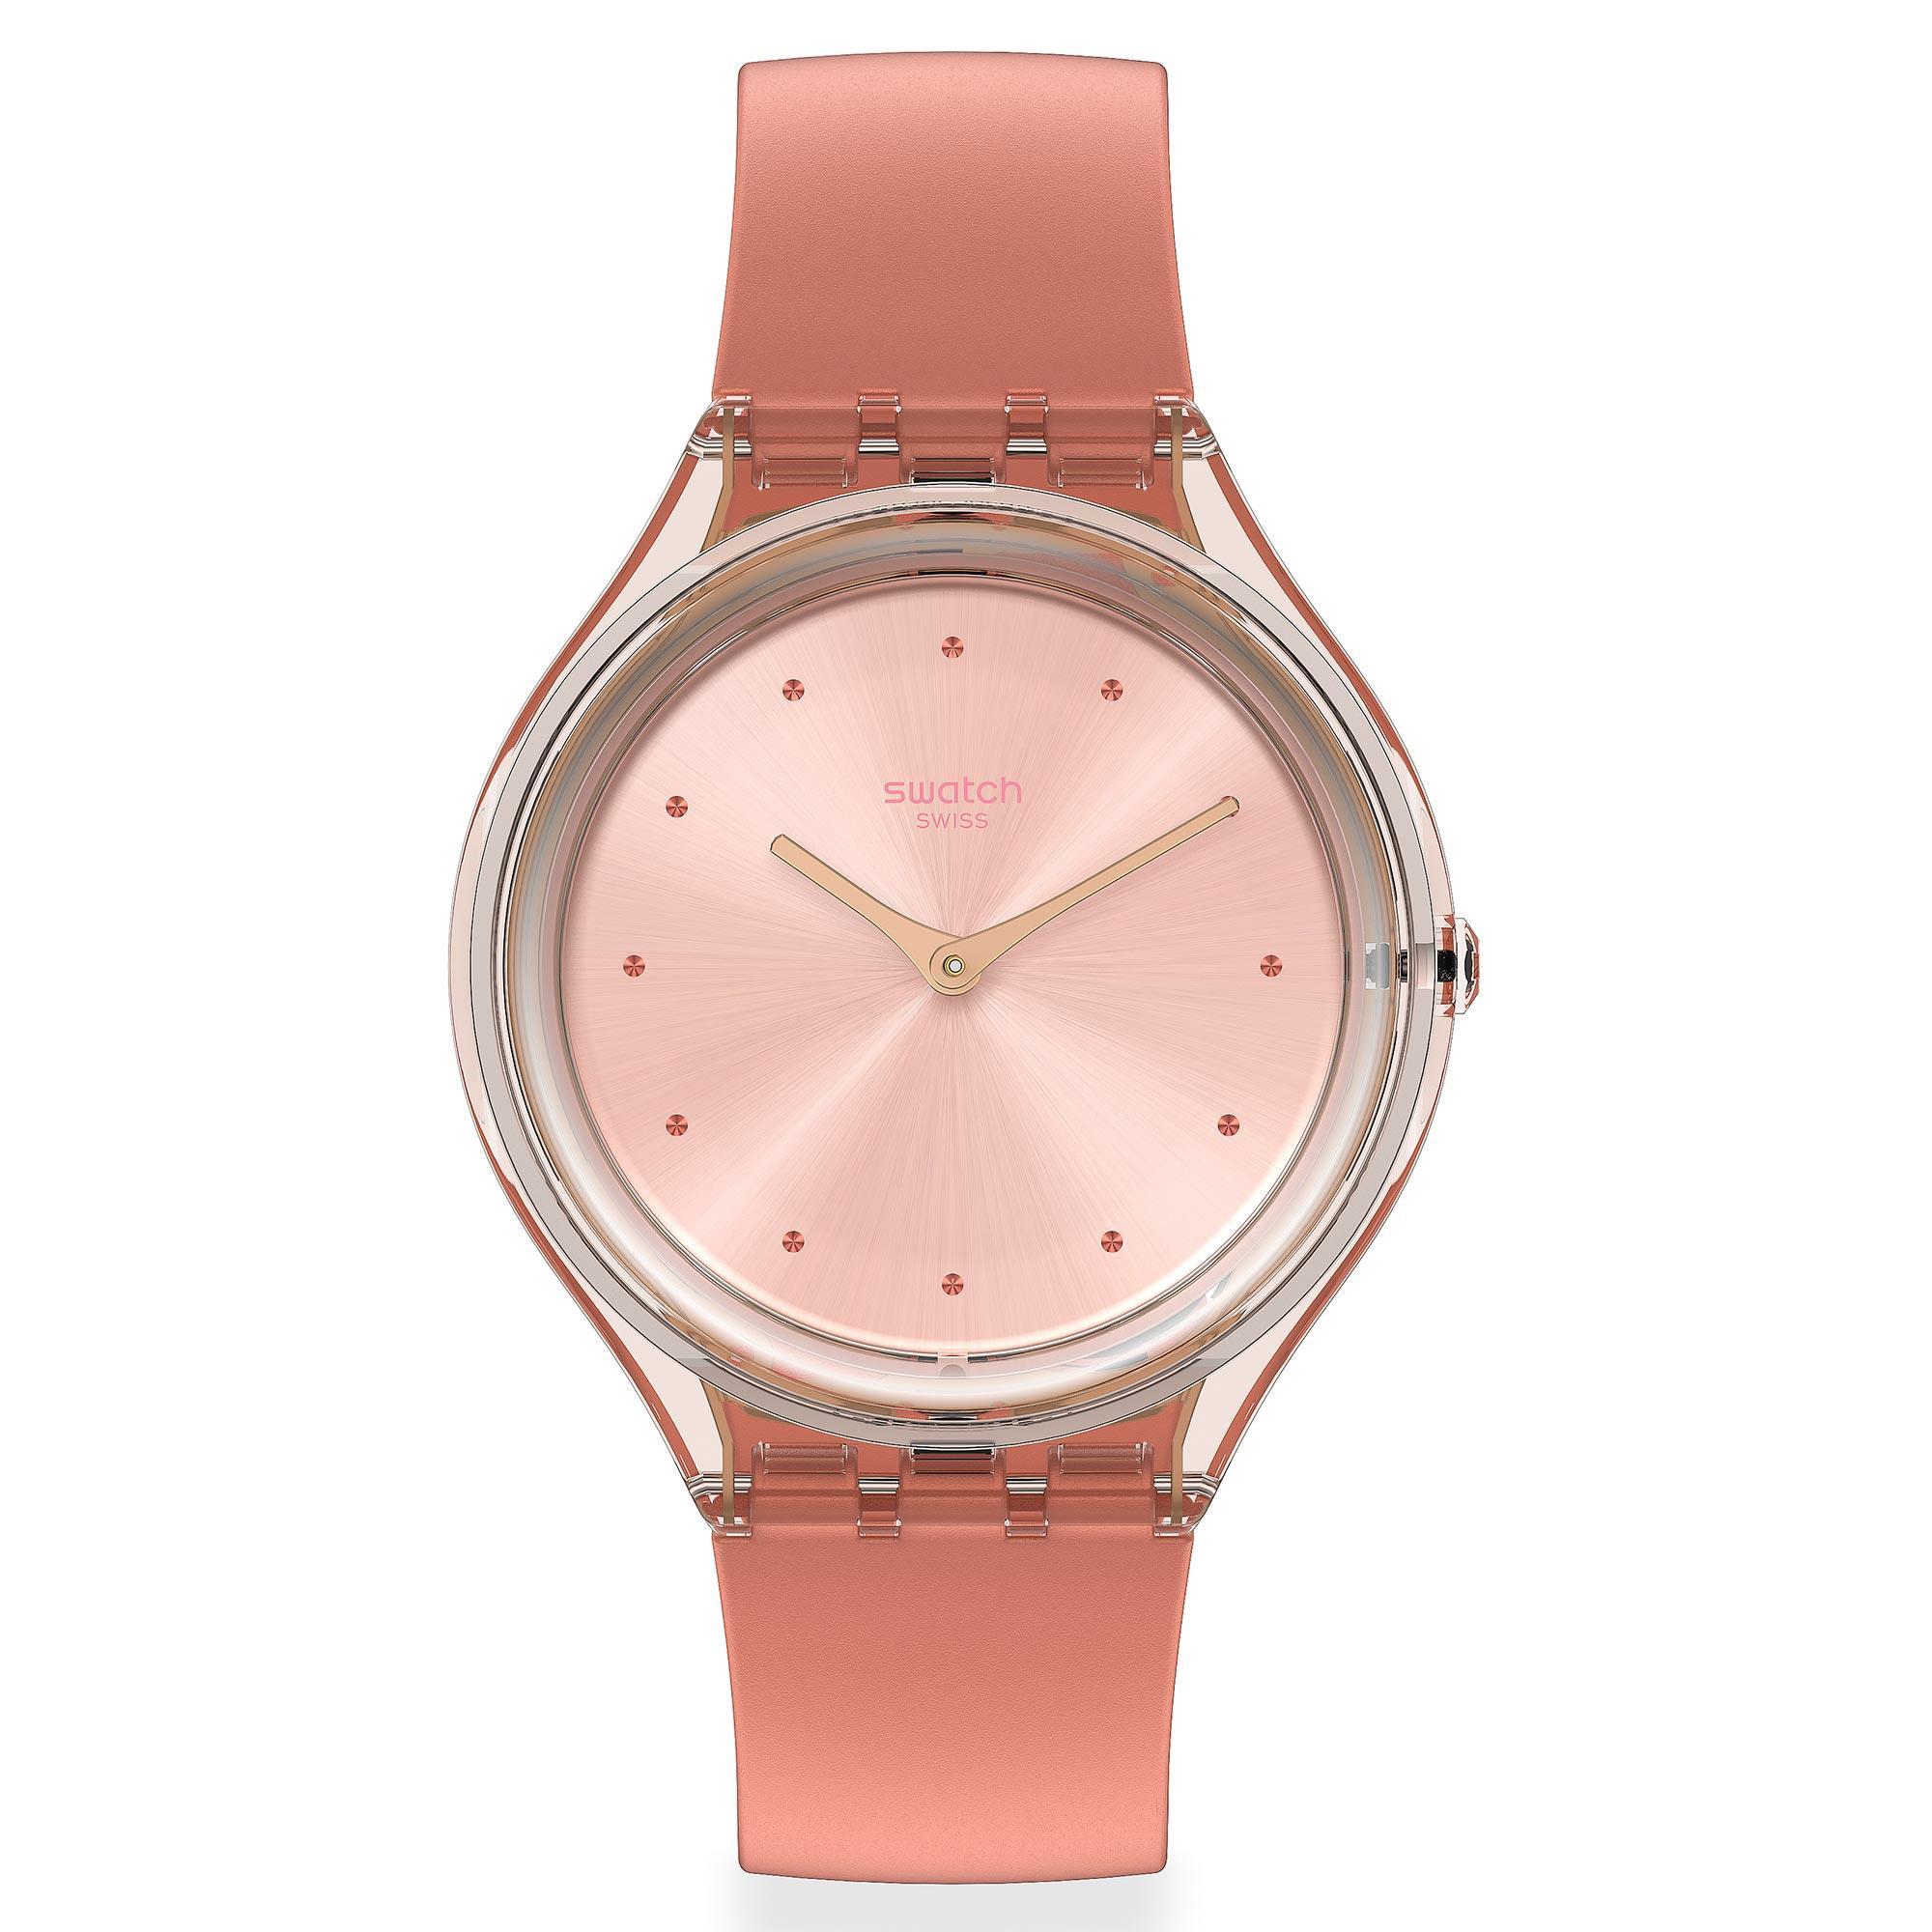 Swatch Skin Amor Quartz Pink Dial Silicone Strap Ladies Watch SVOK108 RRP £85